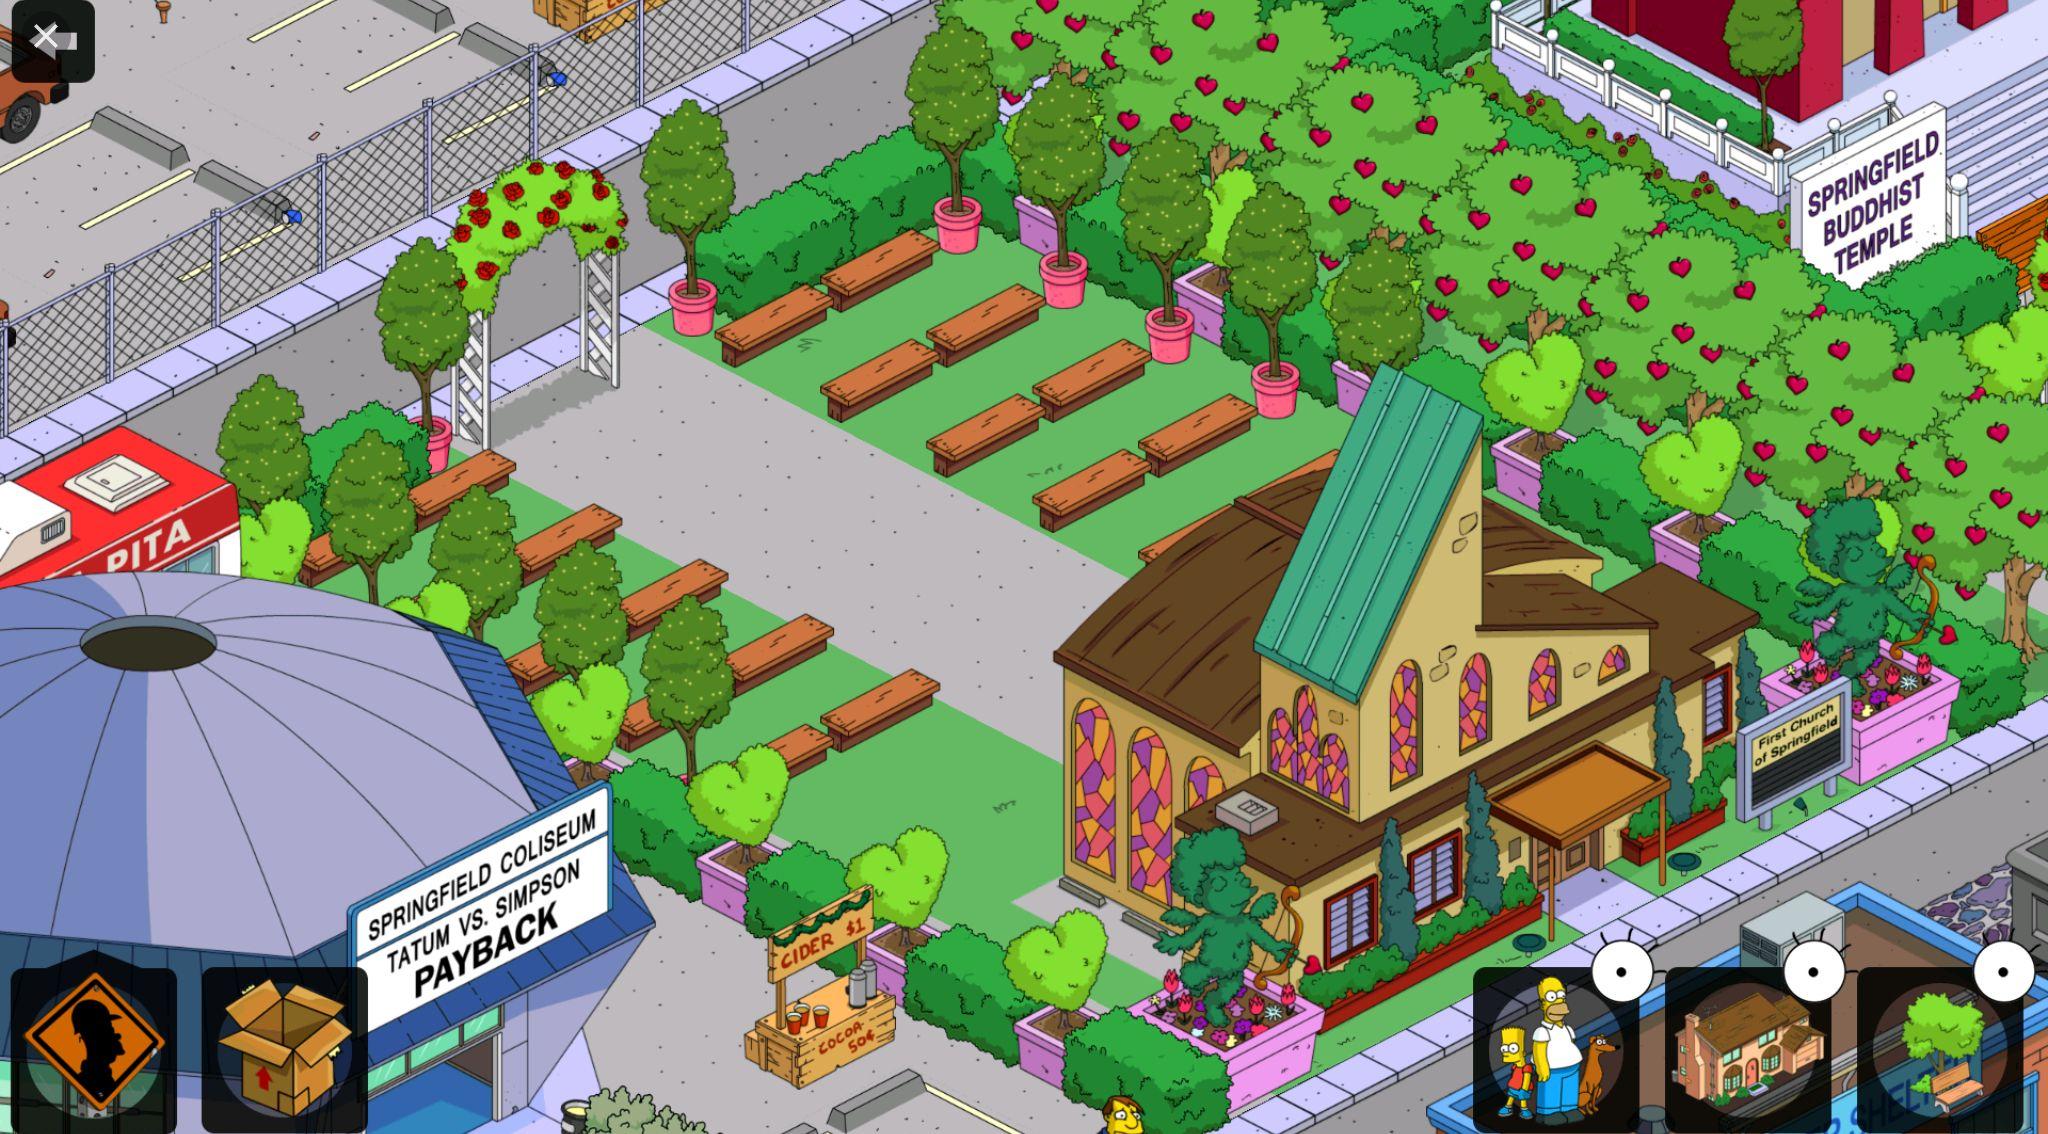 Симпсоны спрингфилд картинки городов